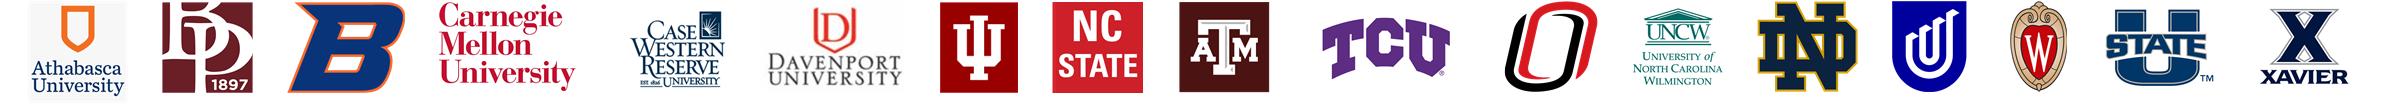 Platform Member Logos 1